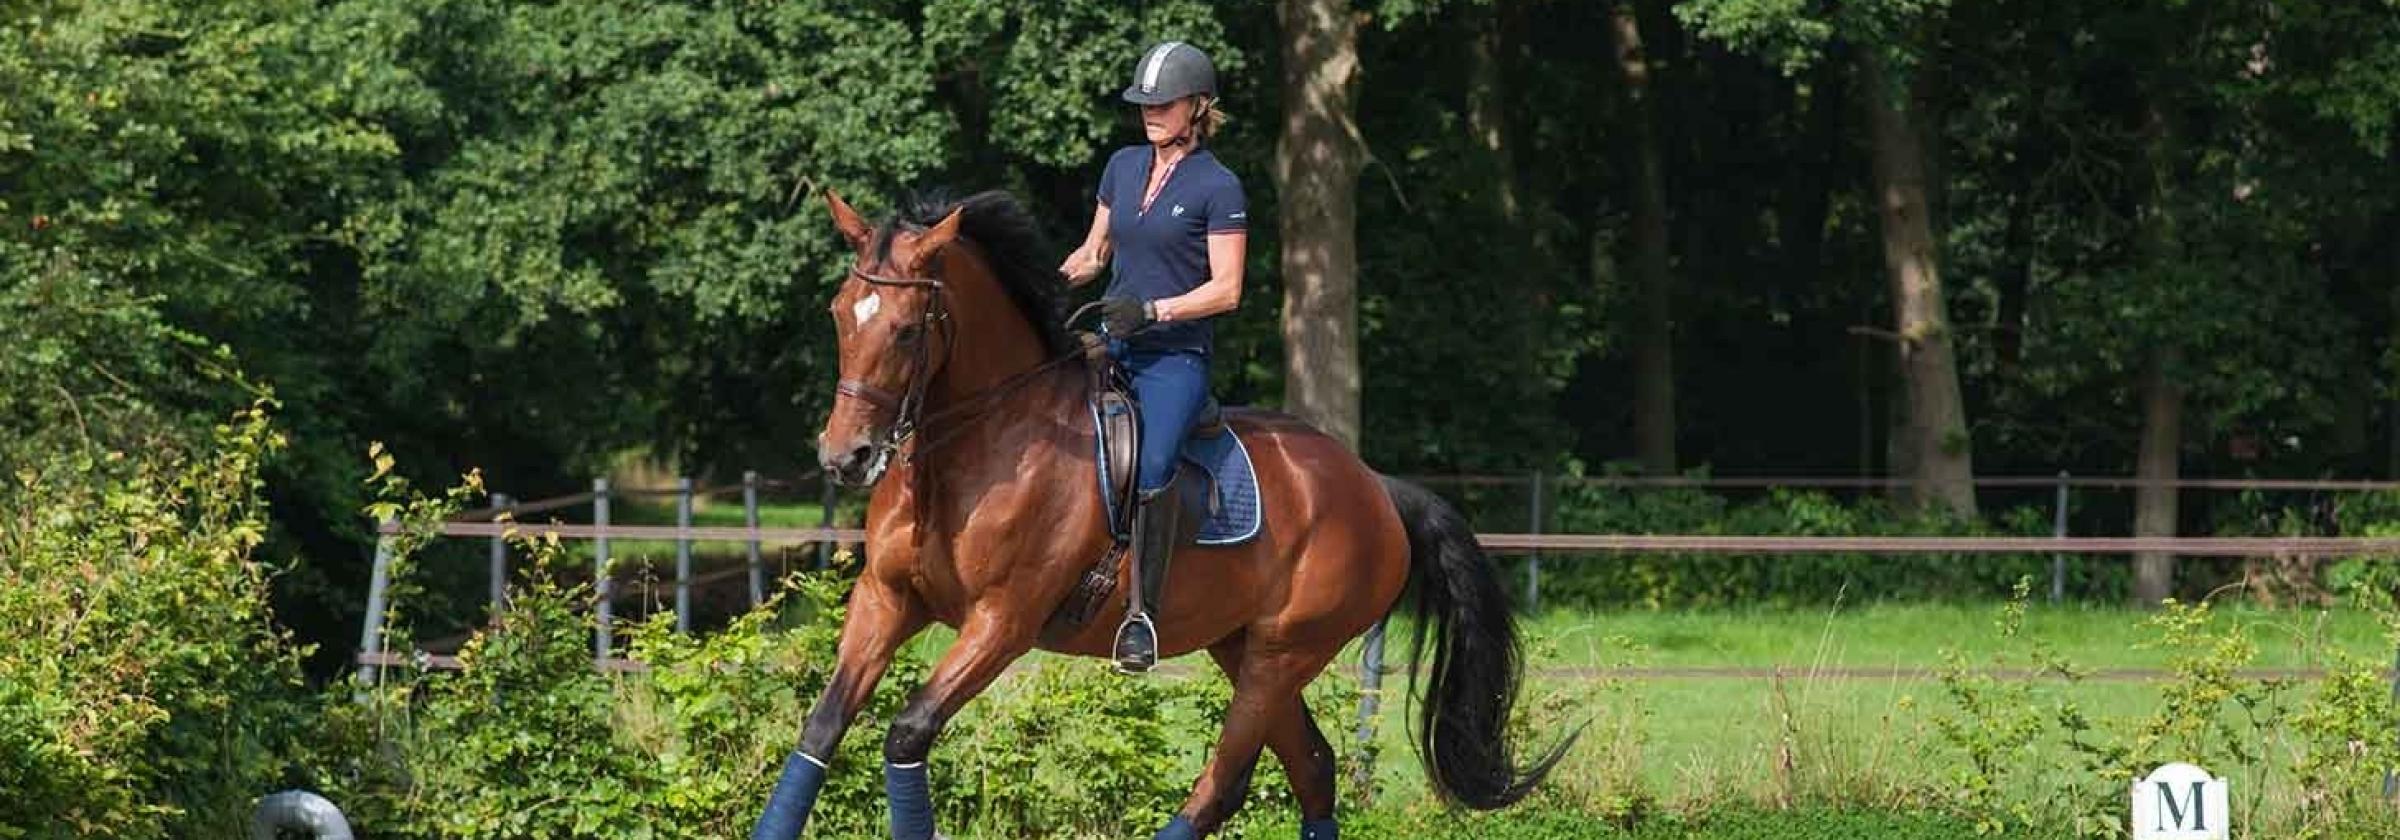 paard_1